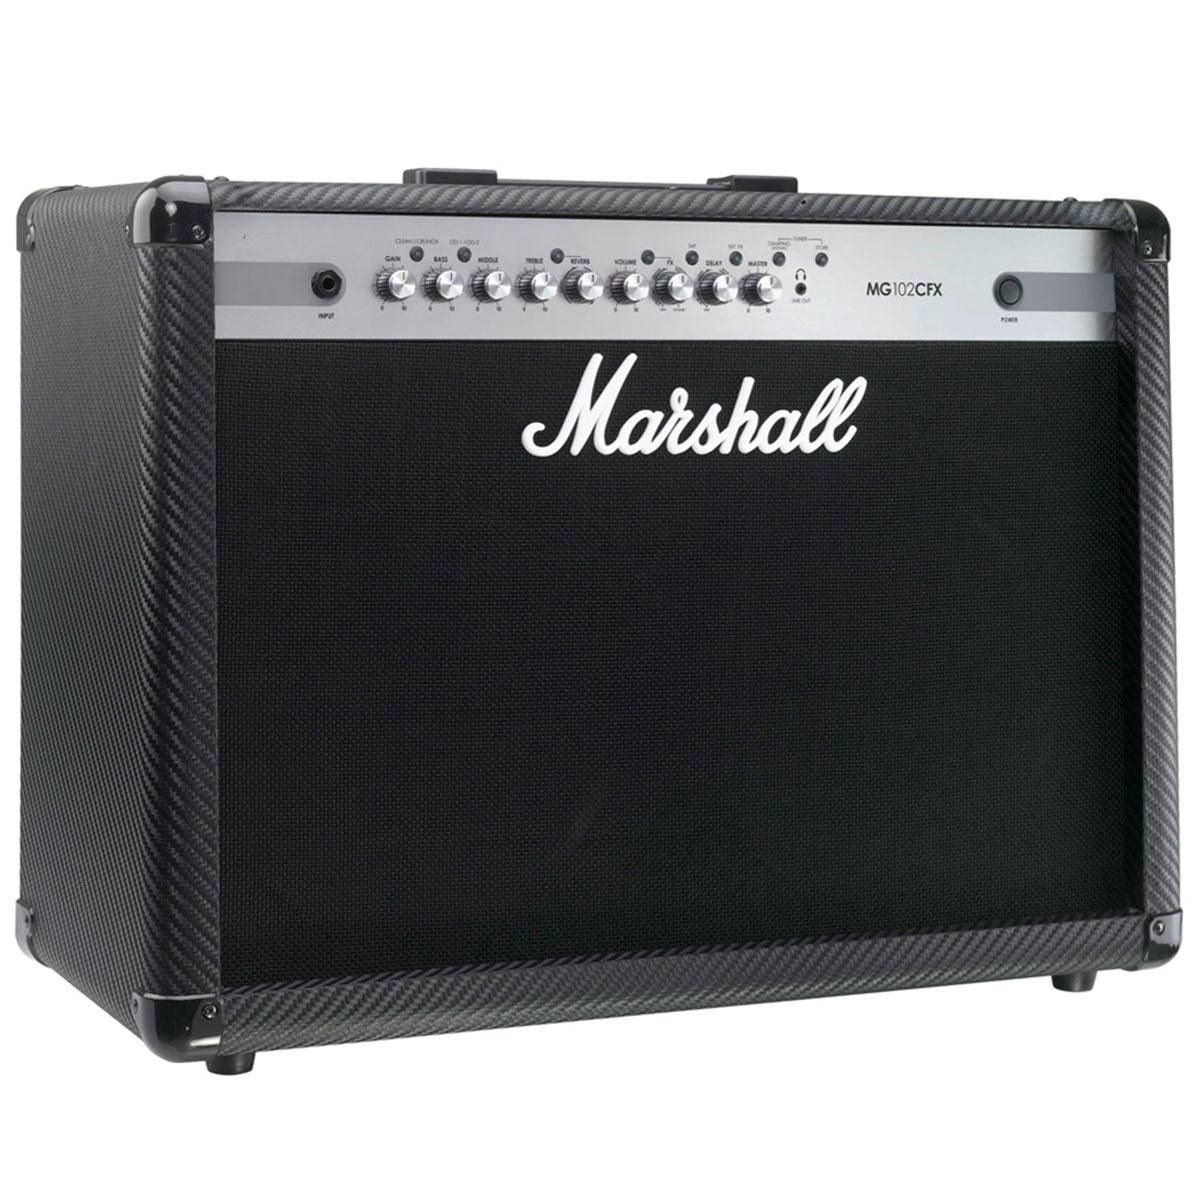 MG102CFX - Amplificador Combo p/ Guitarra Carbon Fiber MG 102 CFX - Marshall